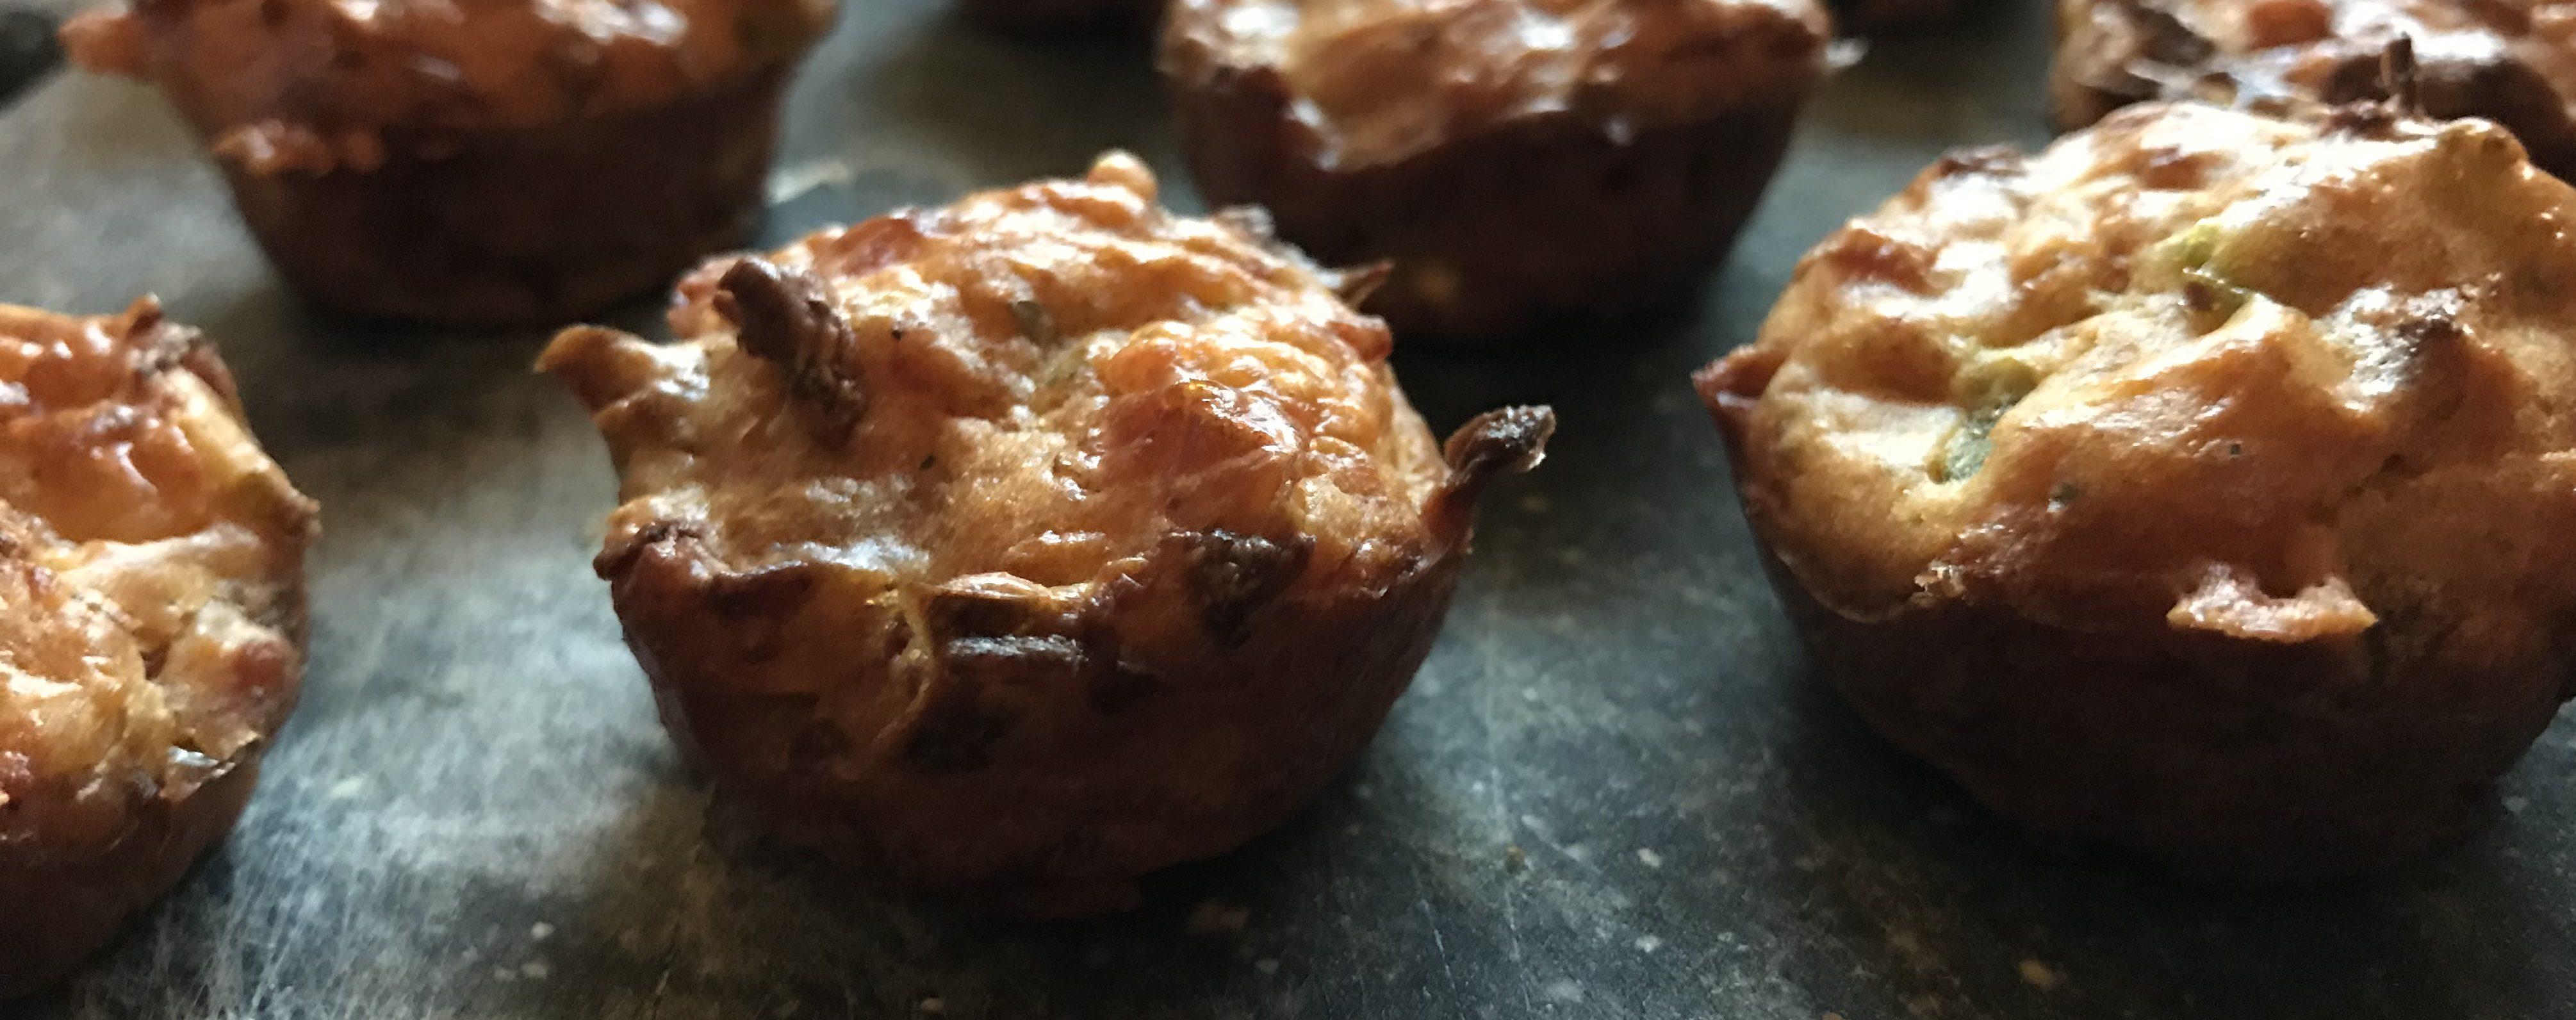 Mini-Muffins-Mundgerecht